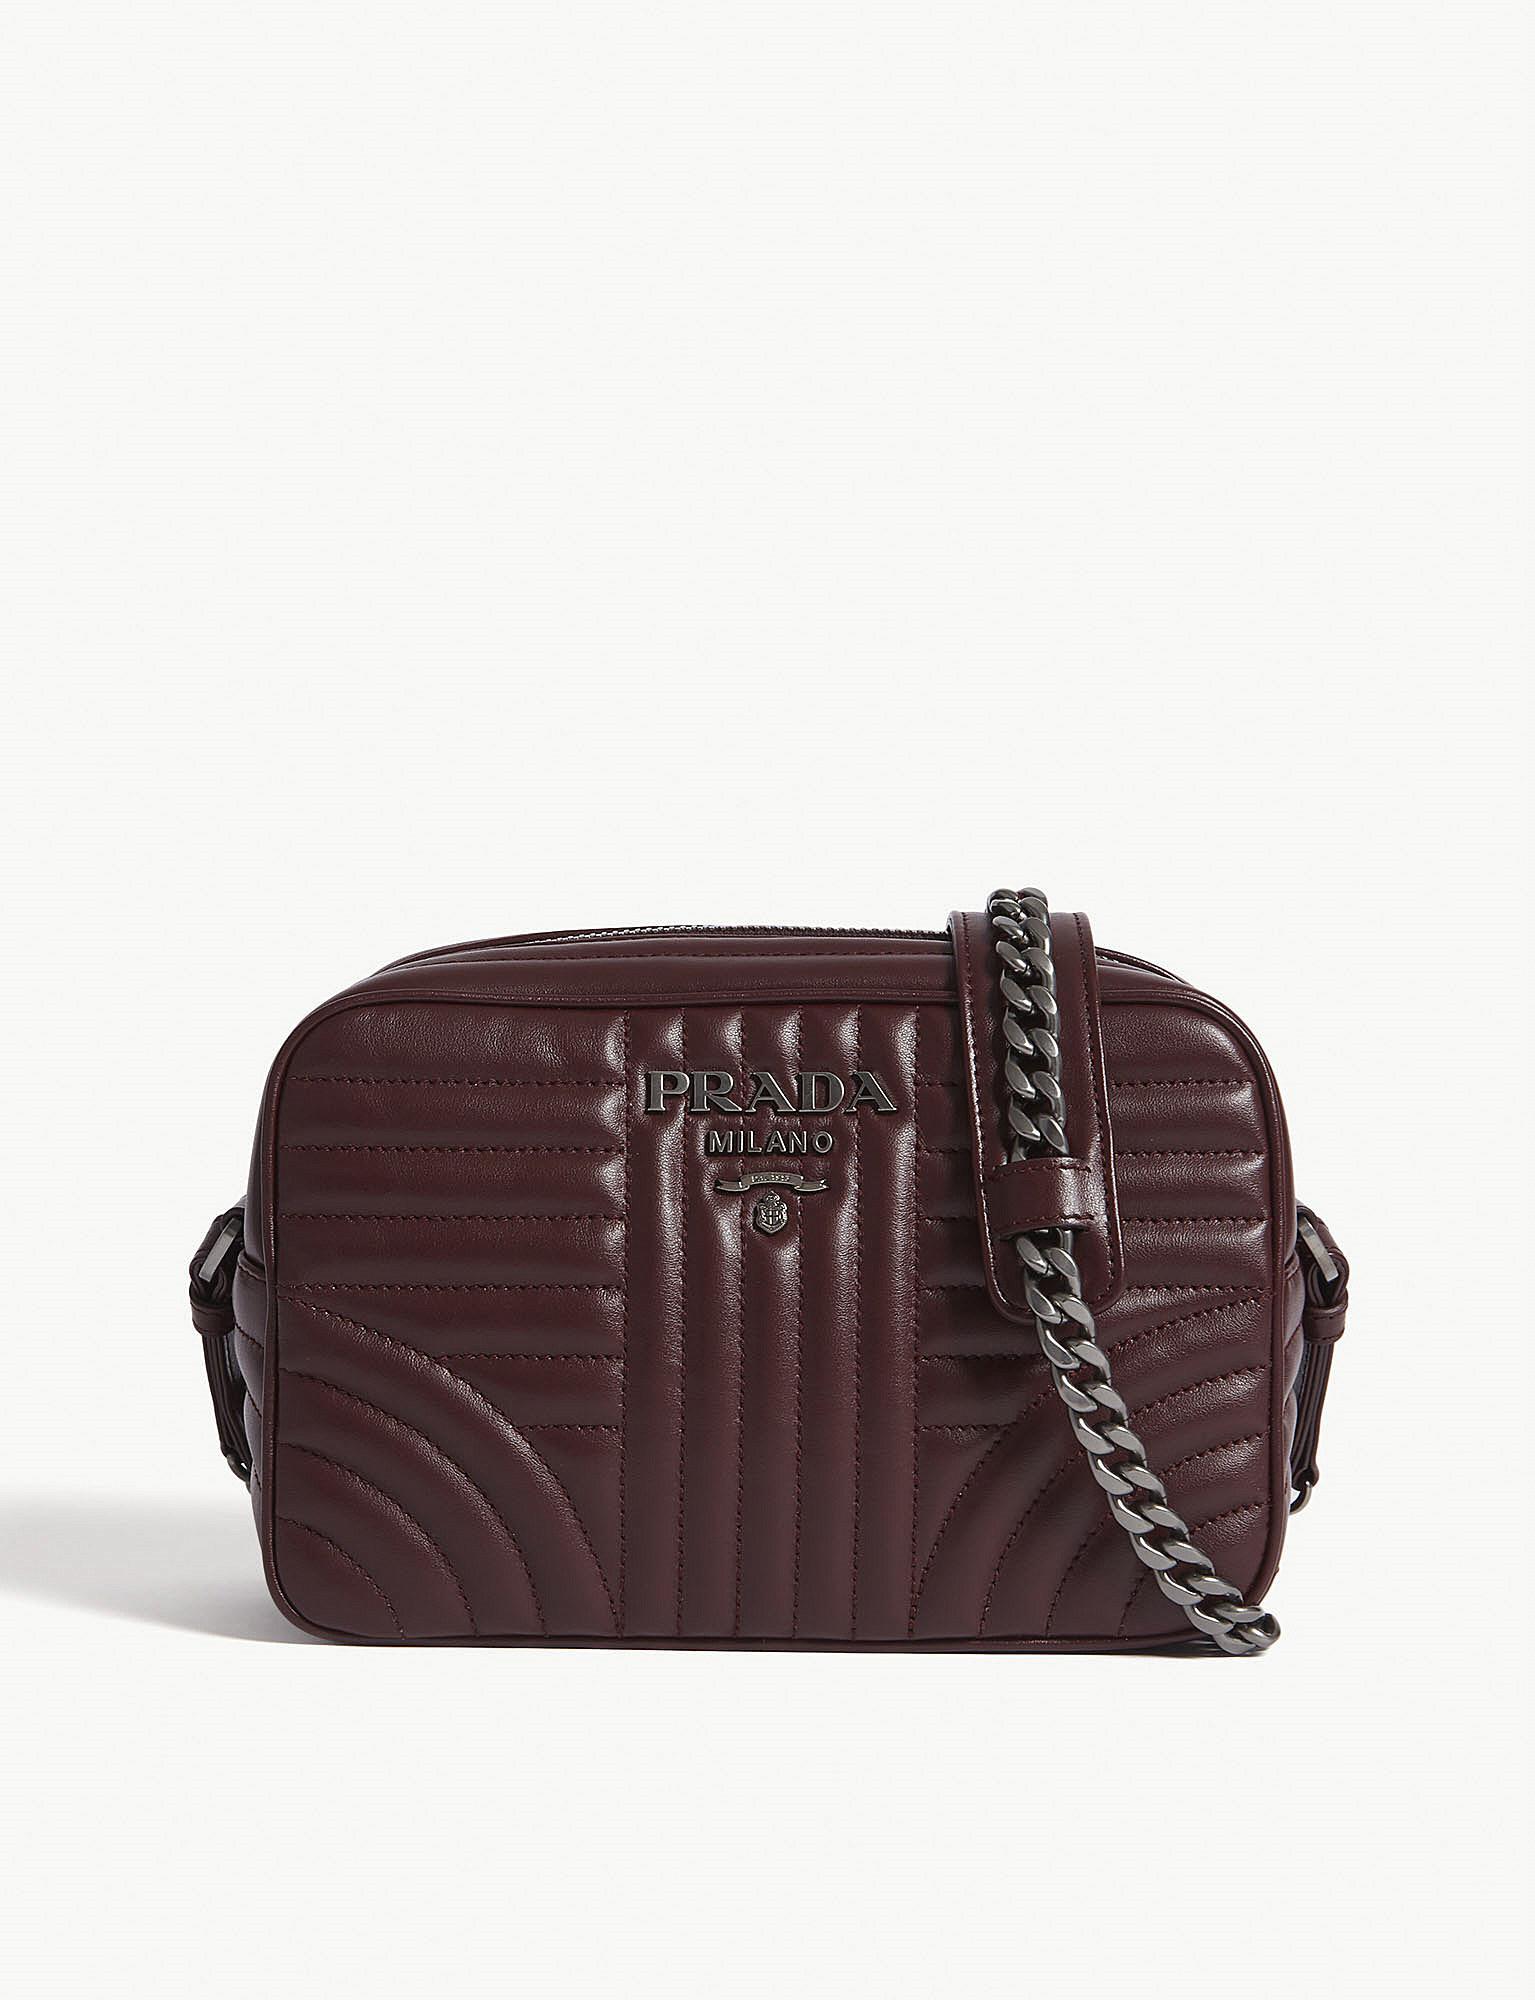 ee1abcf5c44d Prada. Women s Leather Diagramme Camera Bag